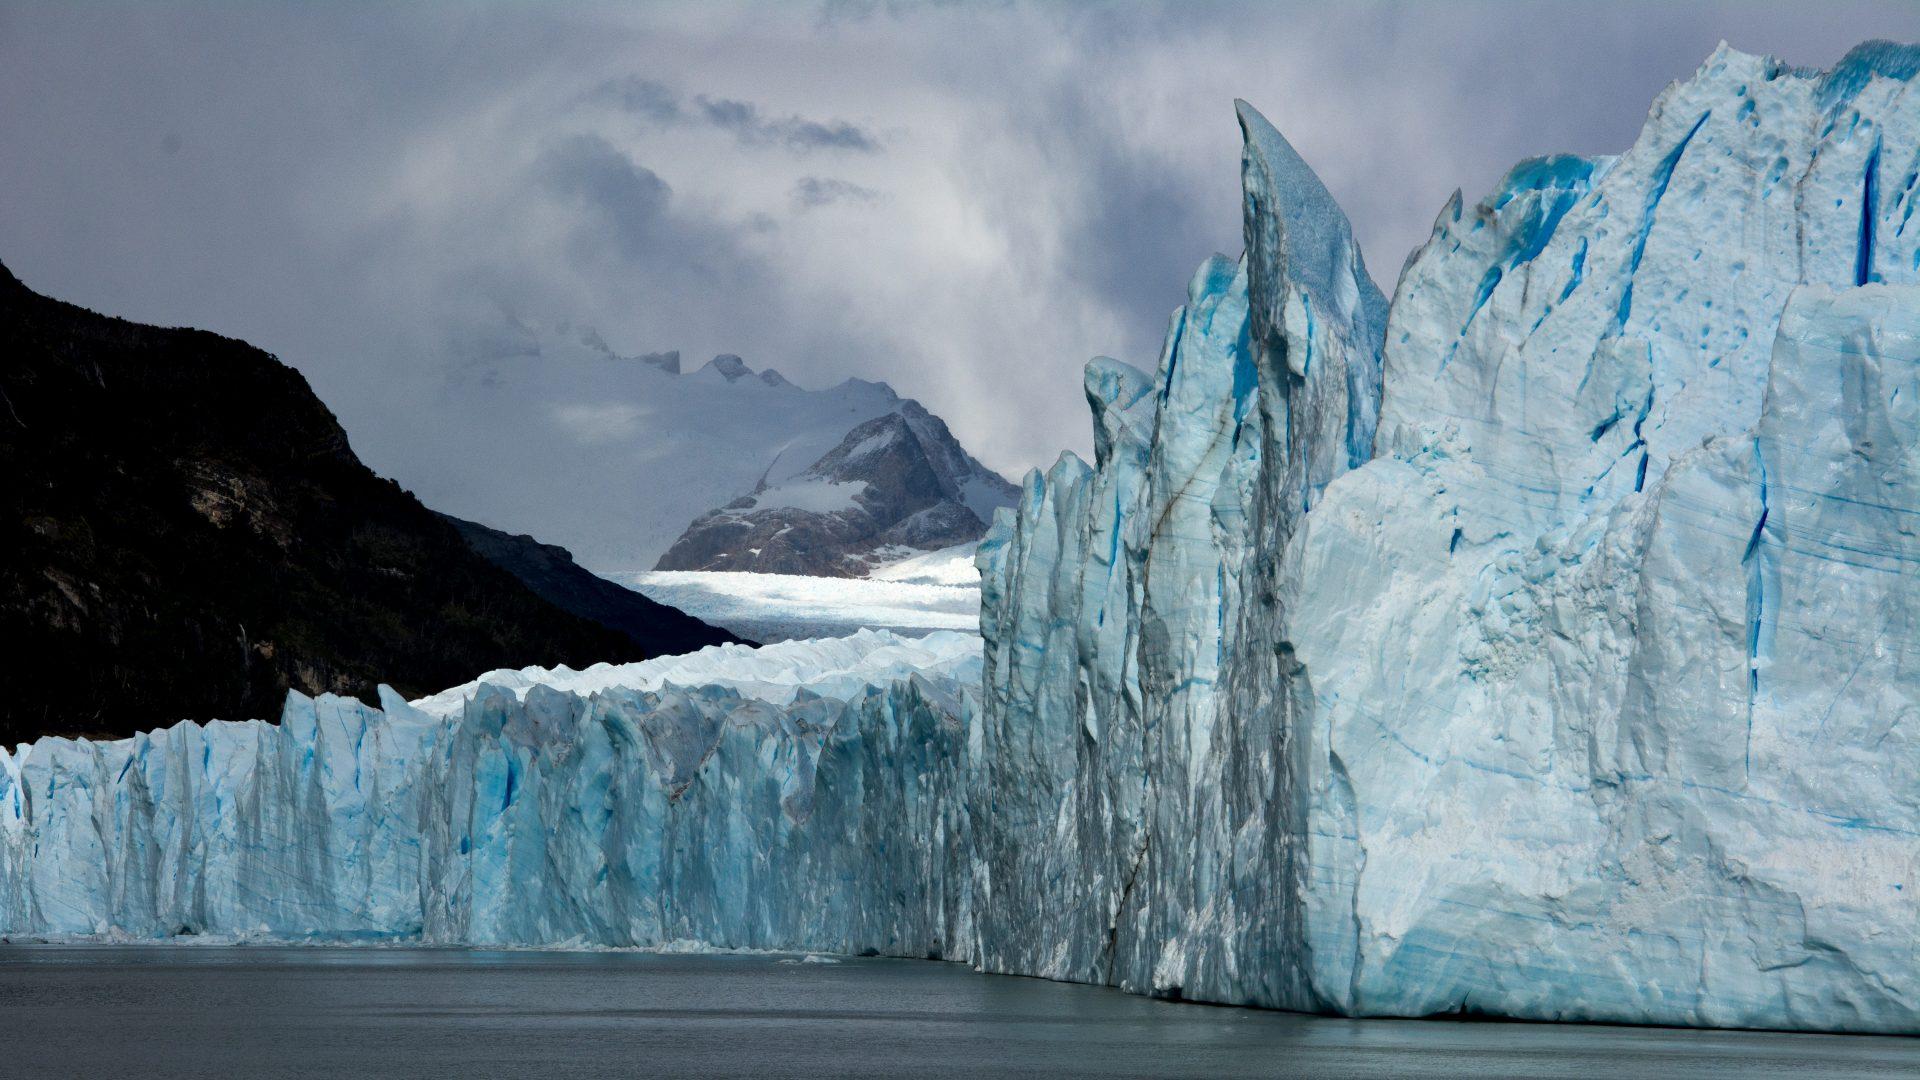 Perito Moreno Glacier (photo credit Howard Bergman)